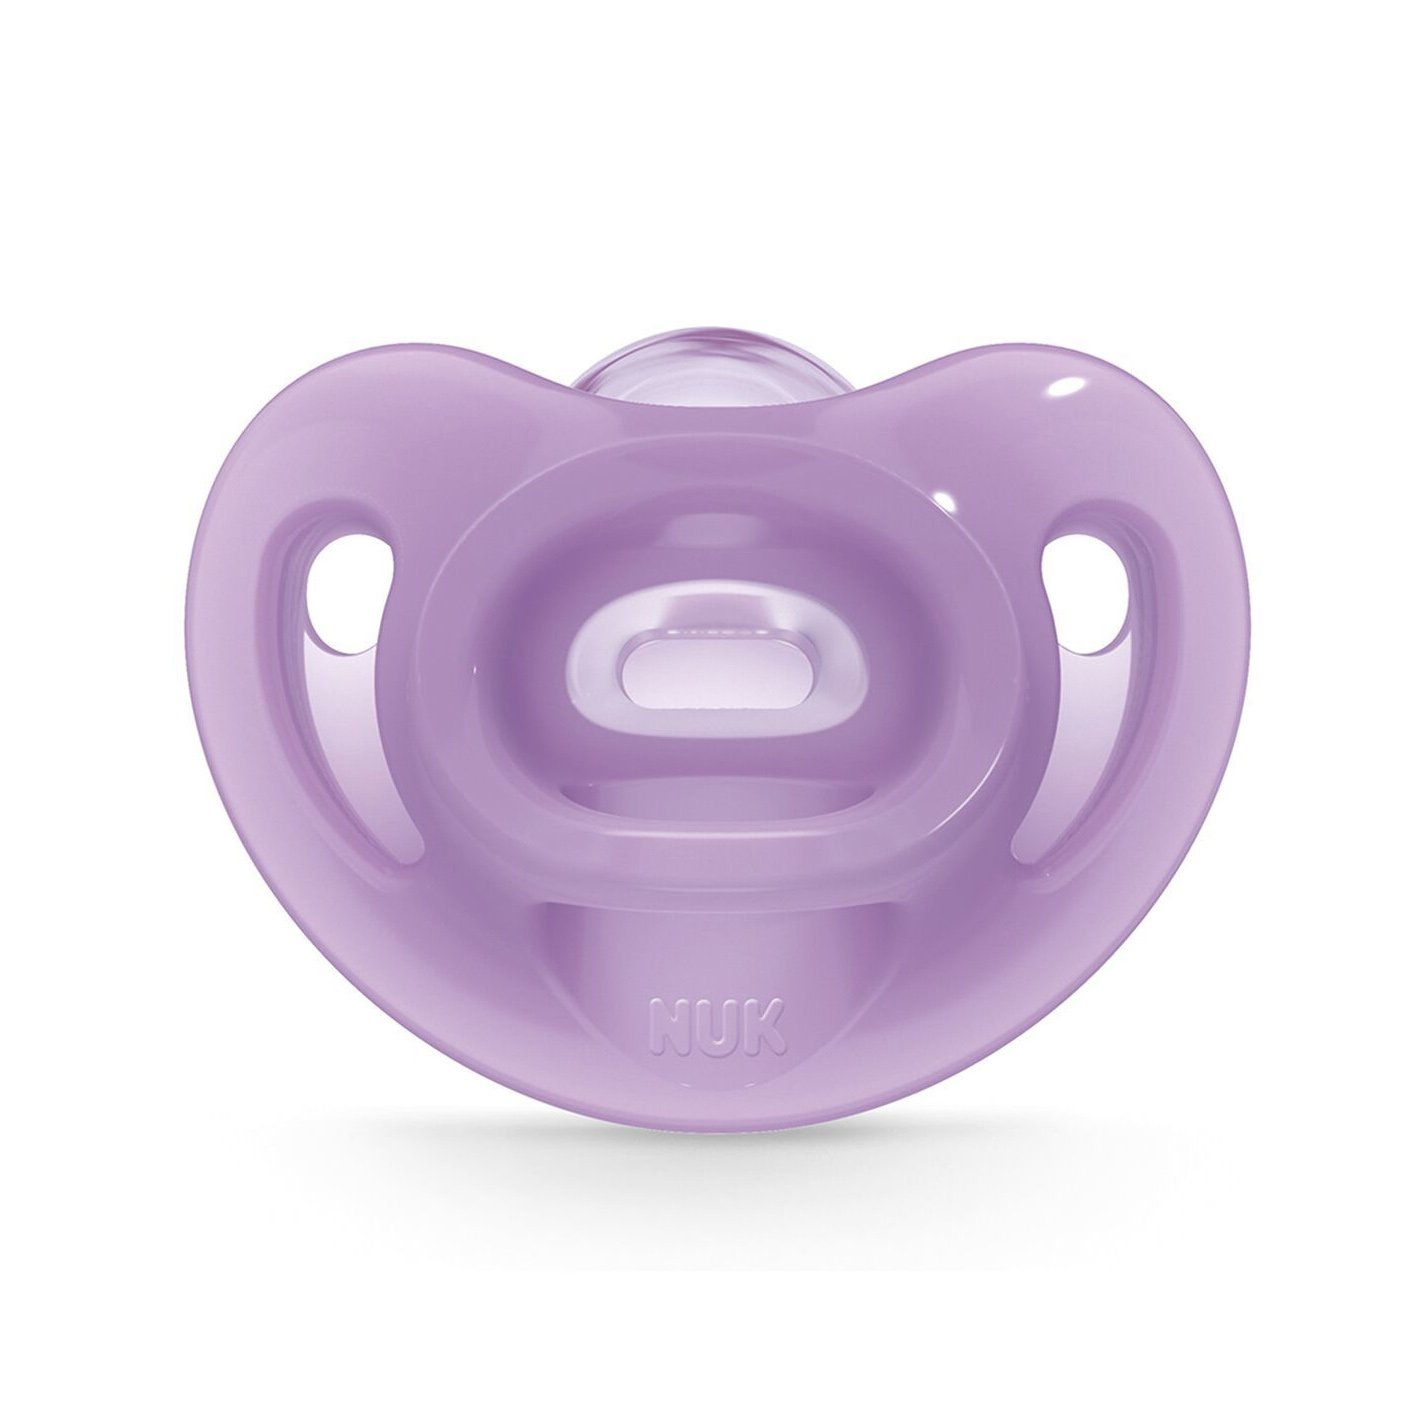 Nuk Sensitive Πιπίλα Όλο Σιλικόνη Εξαιρετικά Μαλακή & Εύκαμπτη 1 Τεμάχιο – 6-18 Μηνών Μωβ